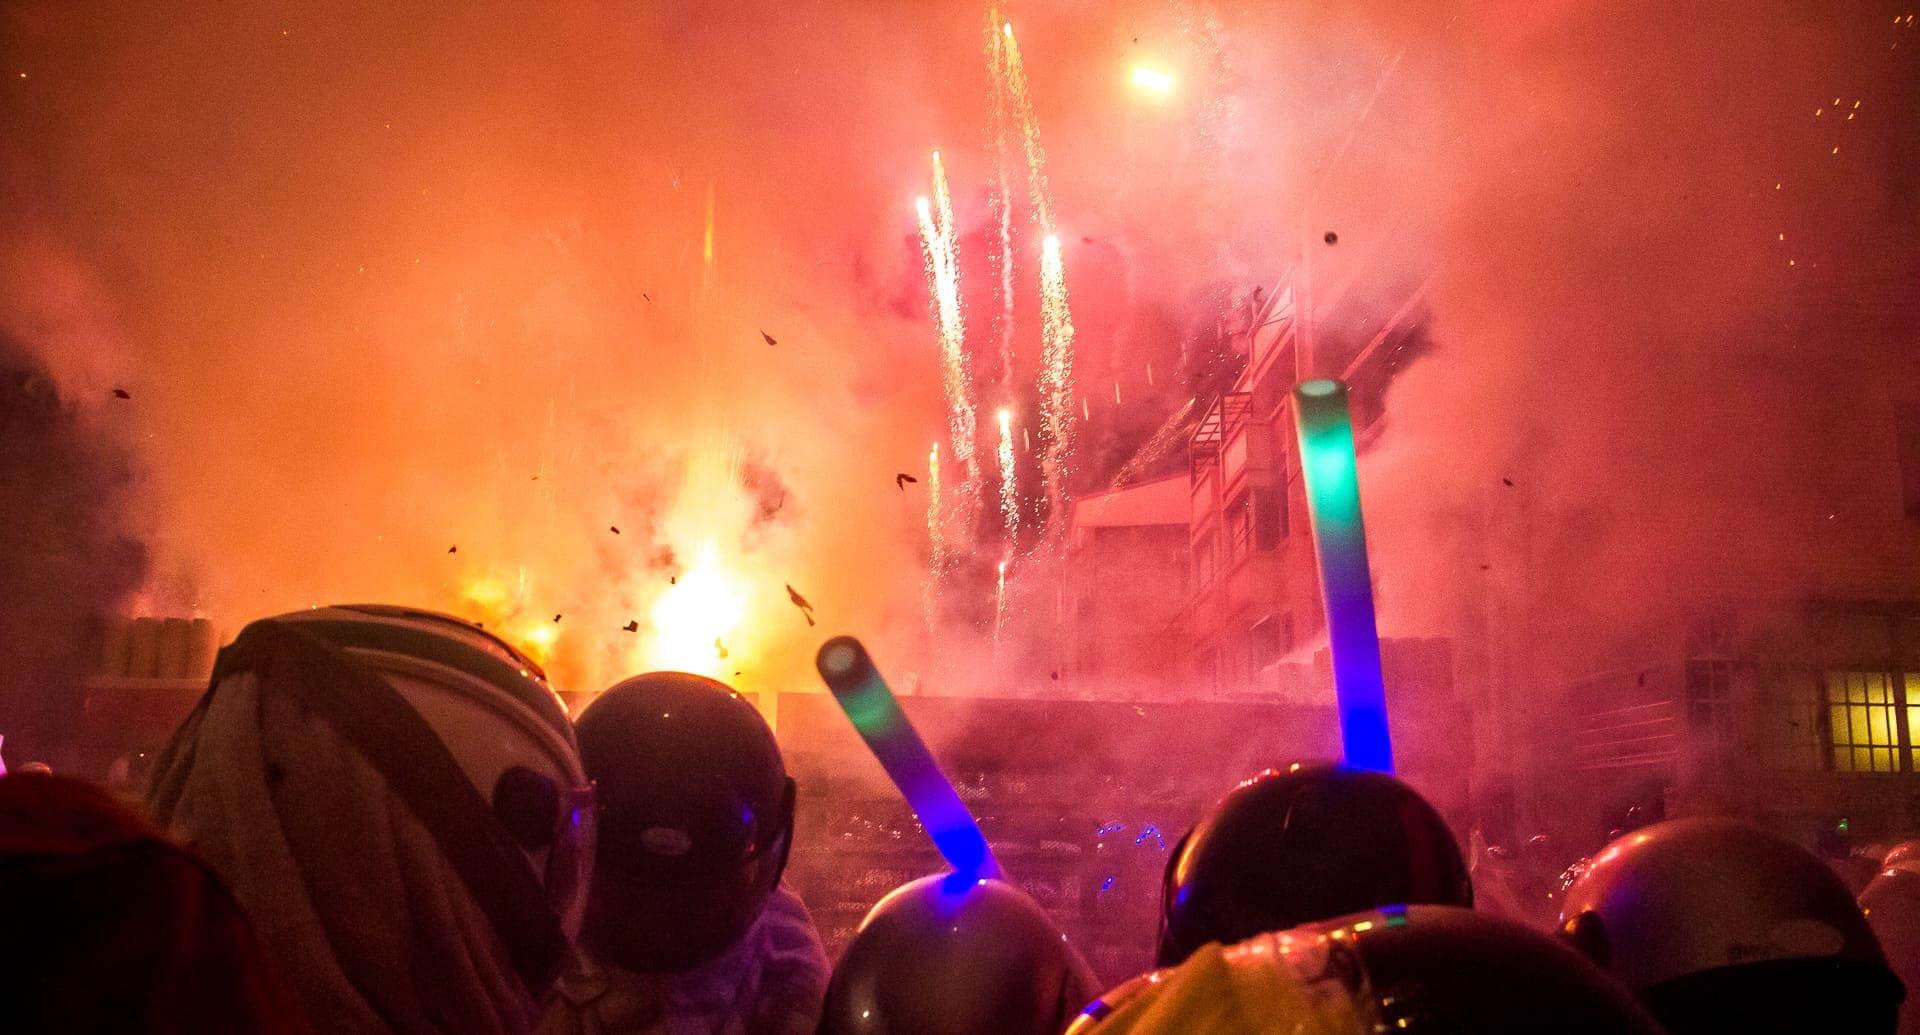 The Yanshui Fireworks Festival in Tainan, Taiwan